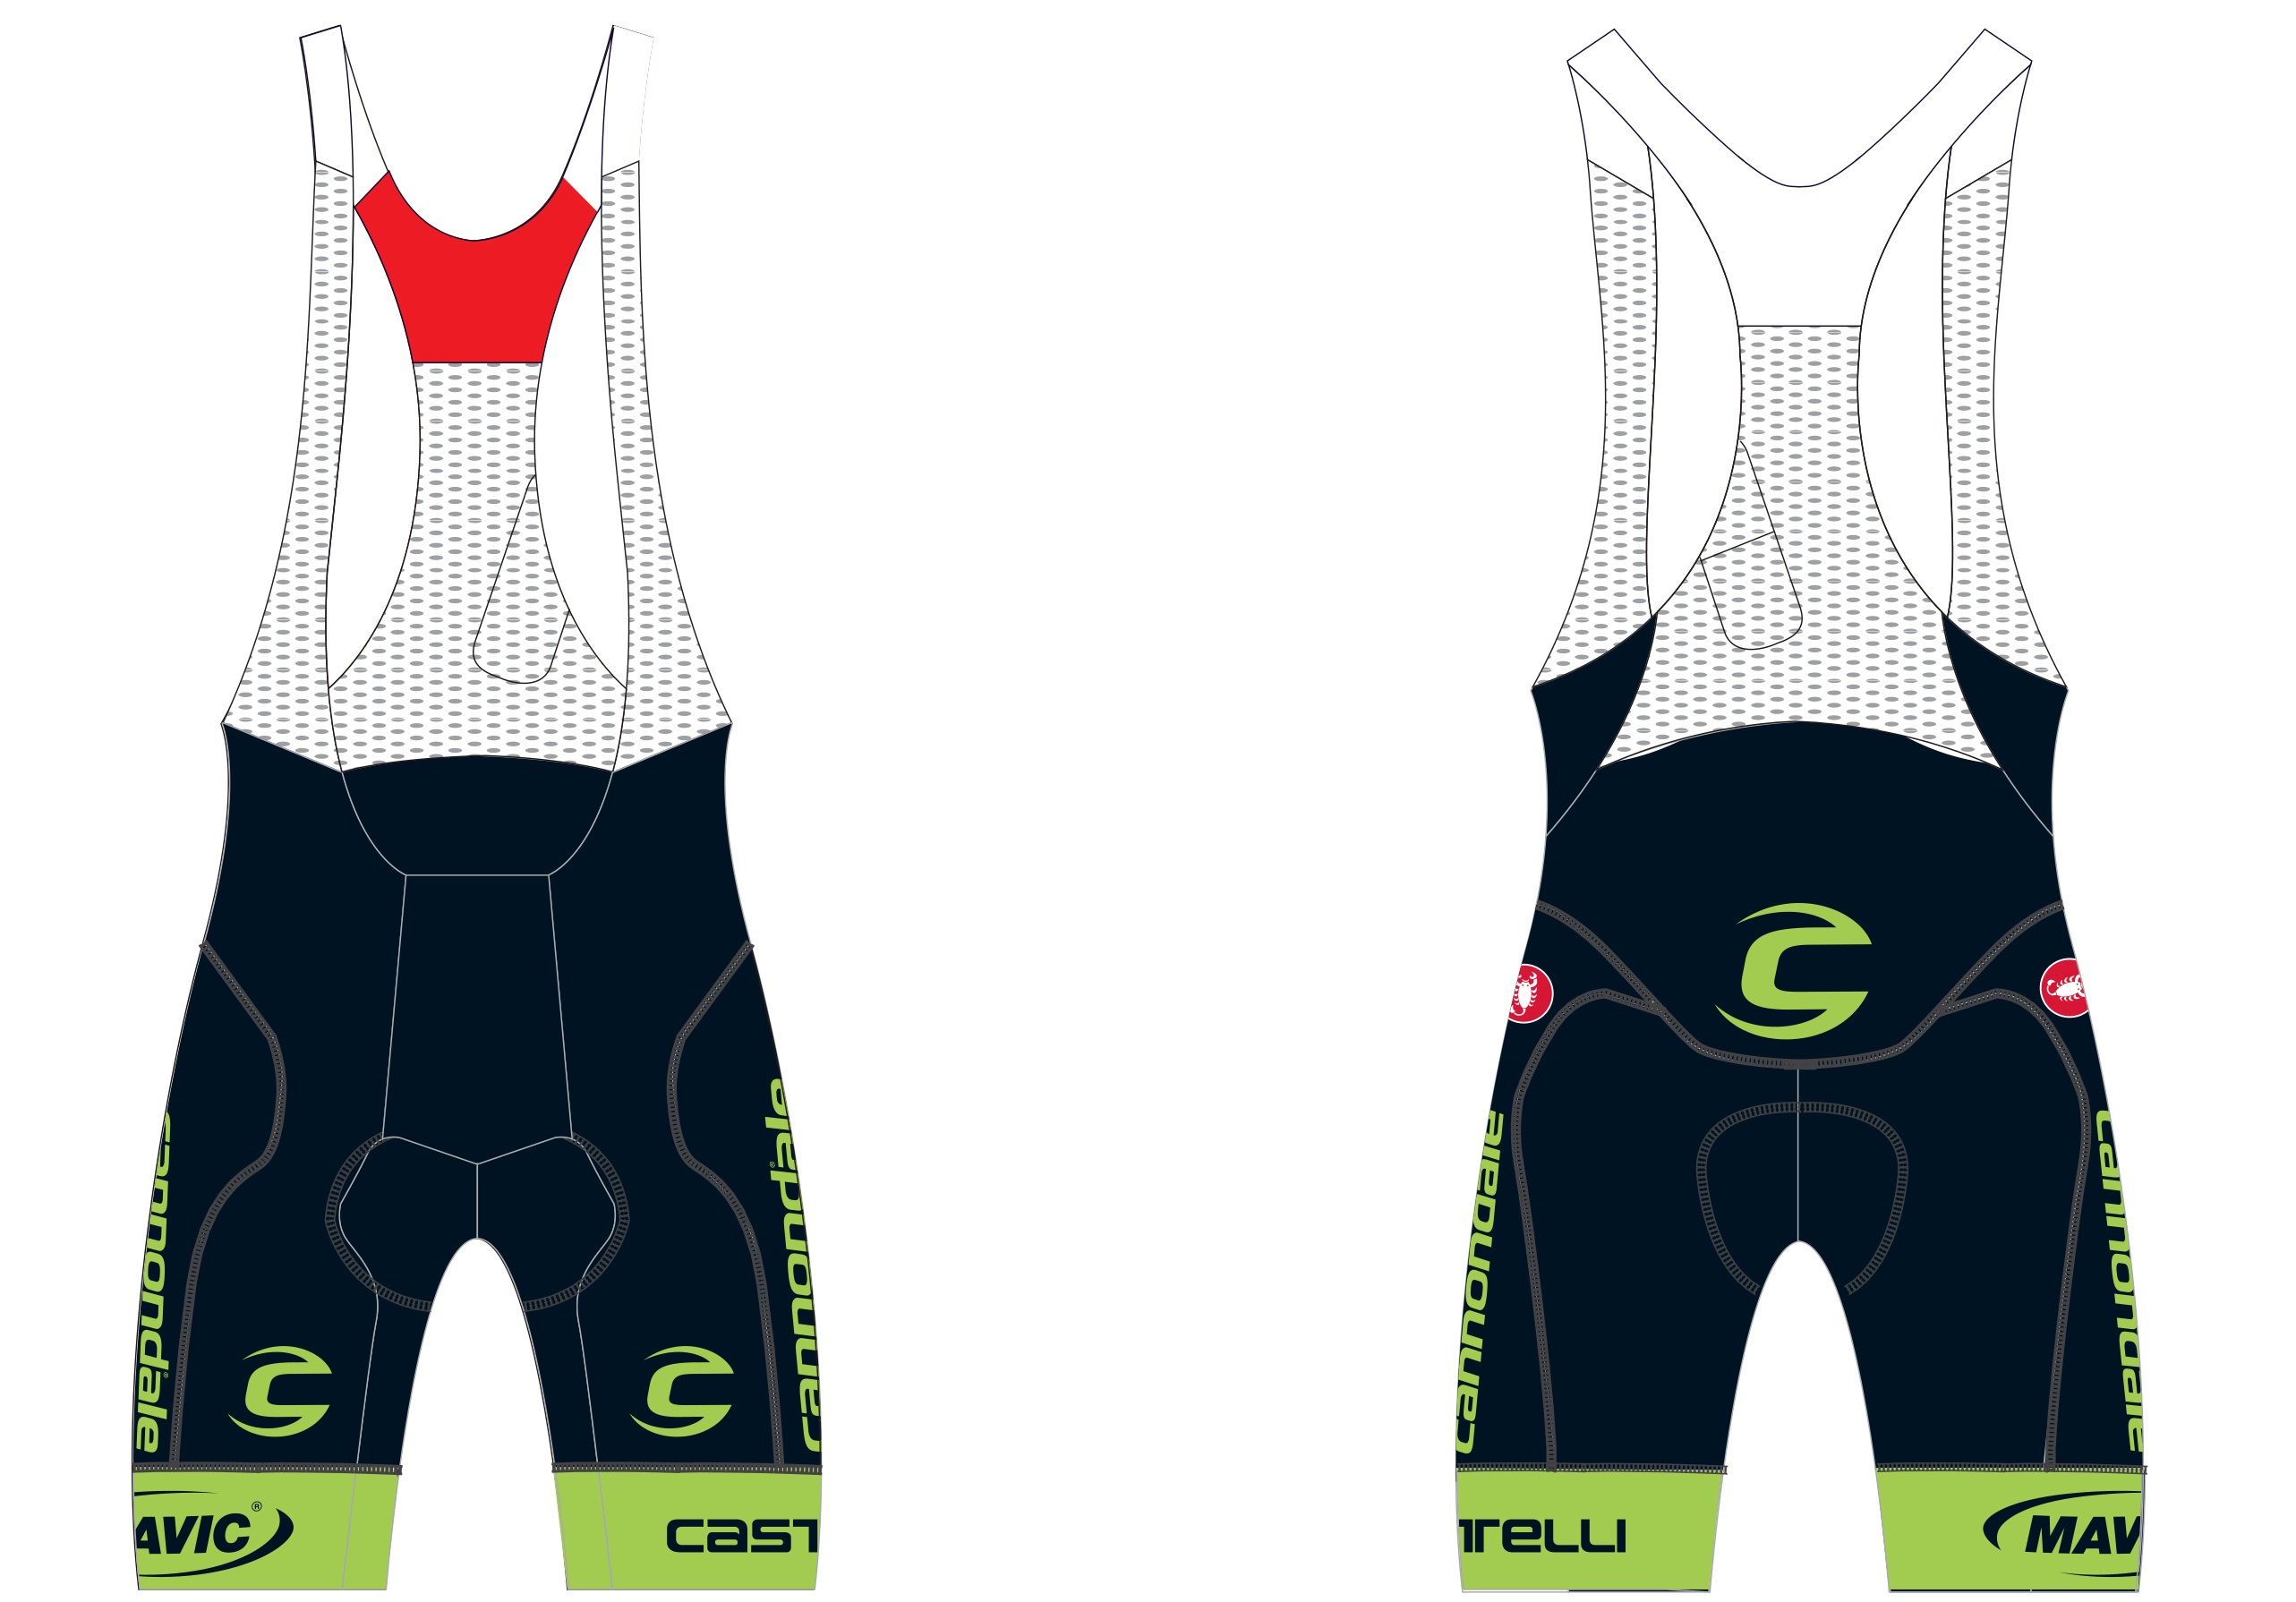 CASTELLI-Cannondale-Garmin-ProTeam-kit-